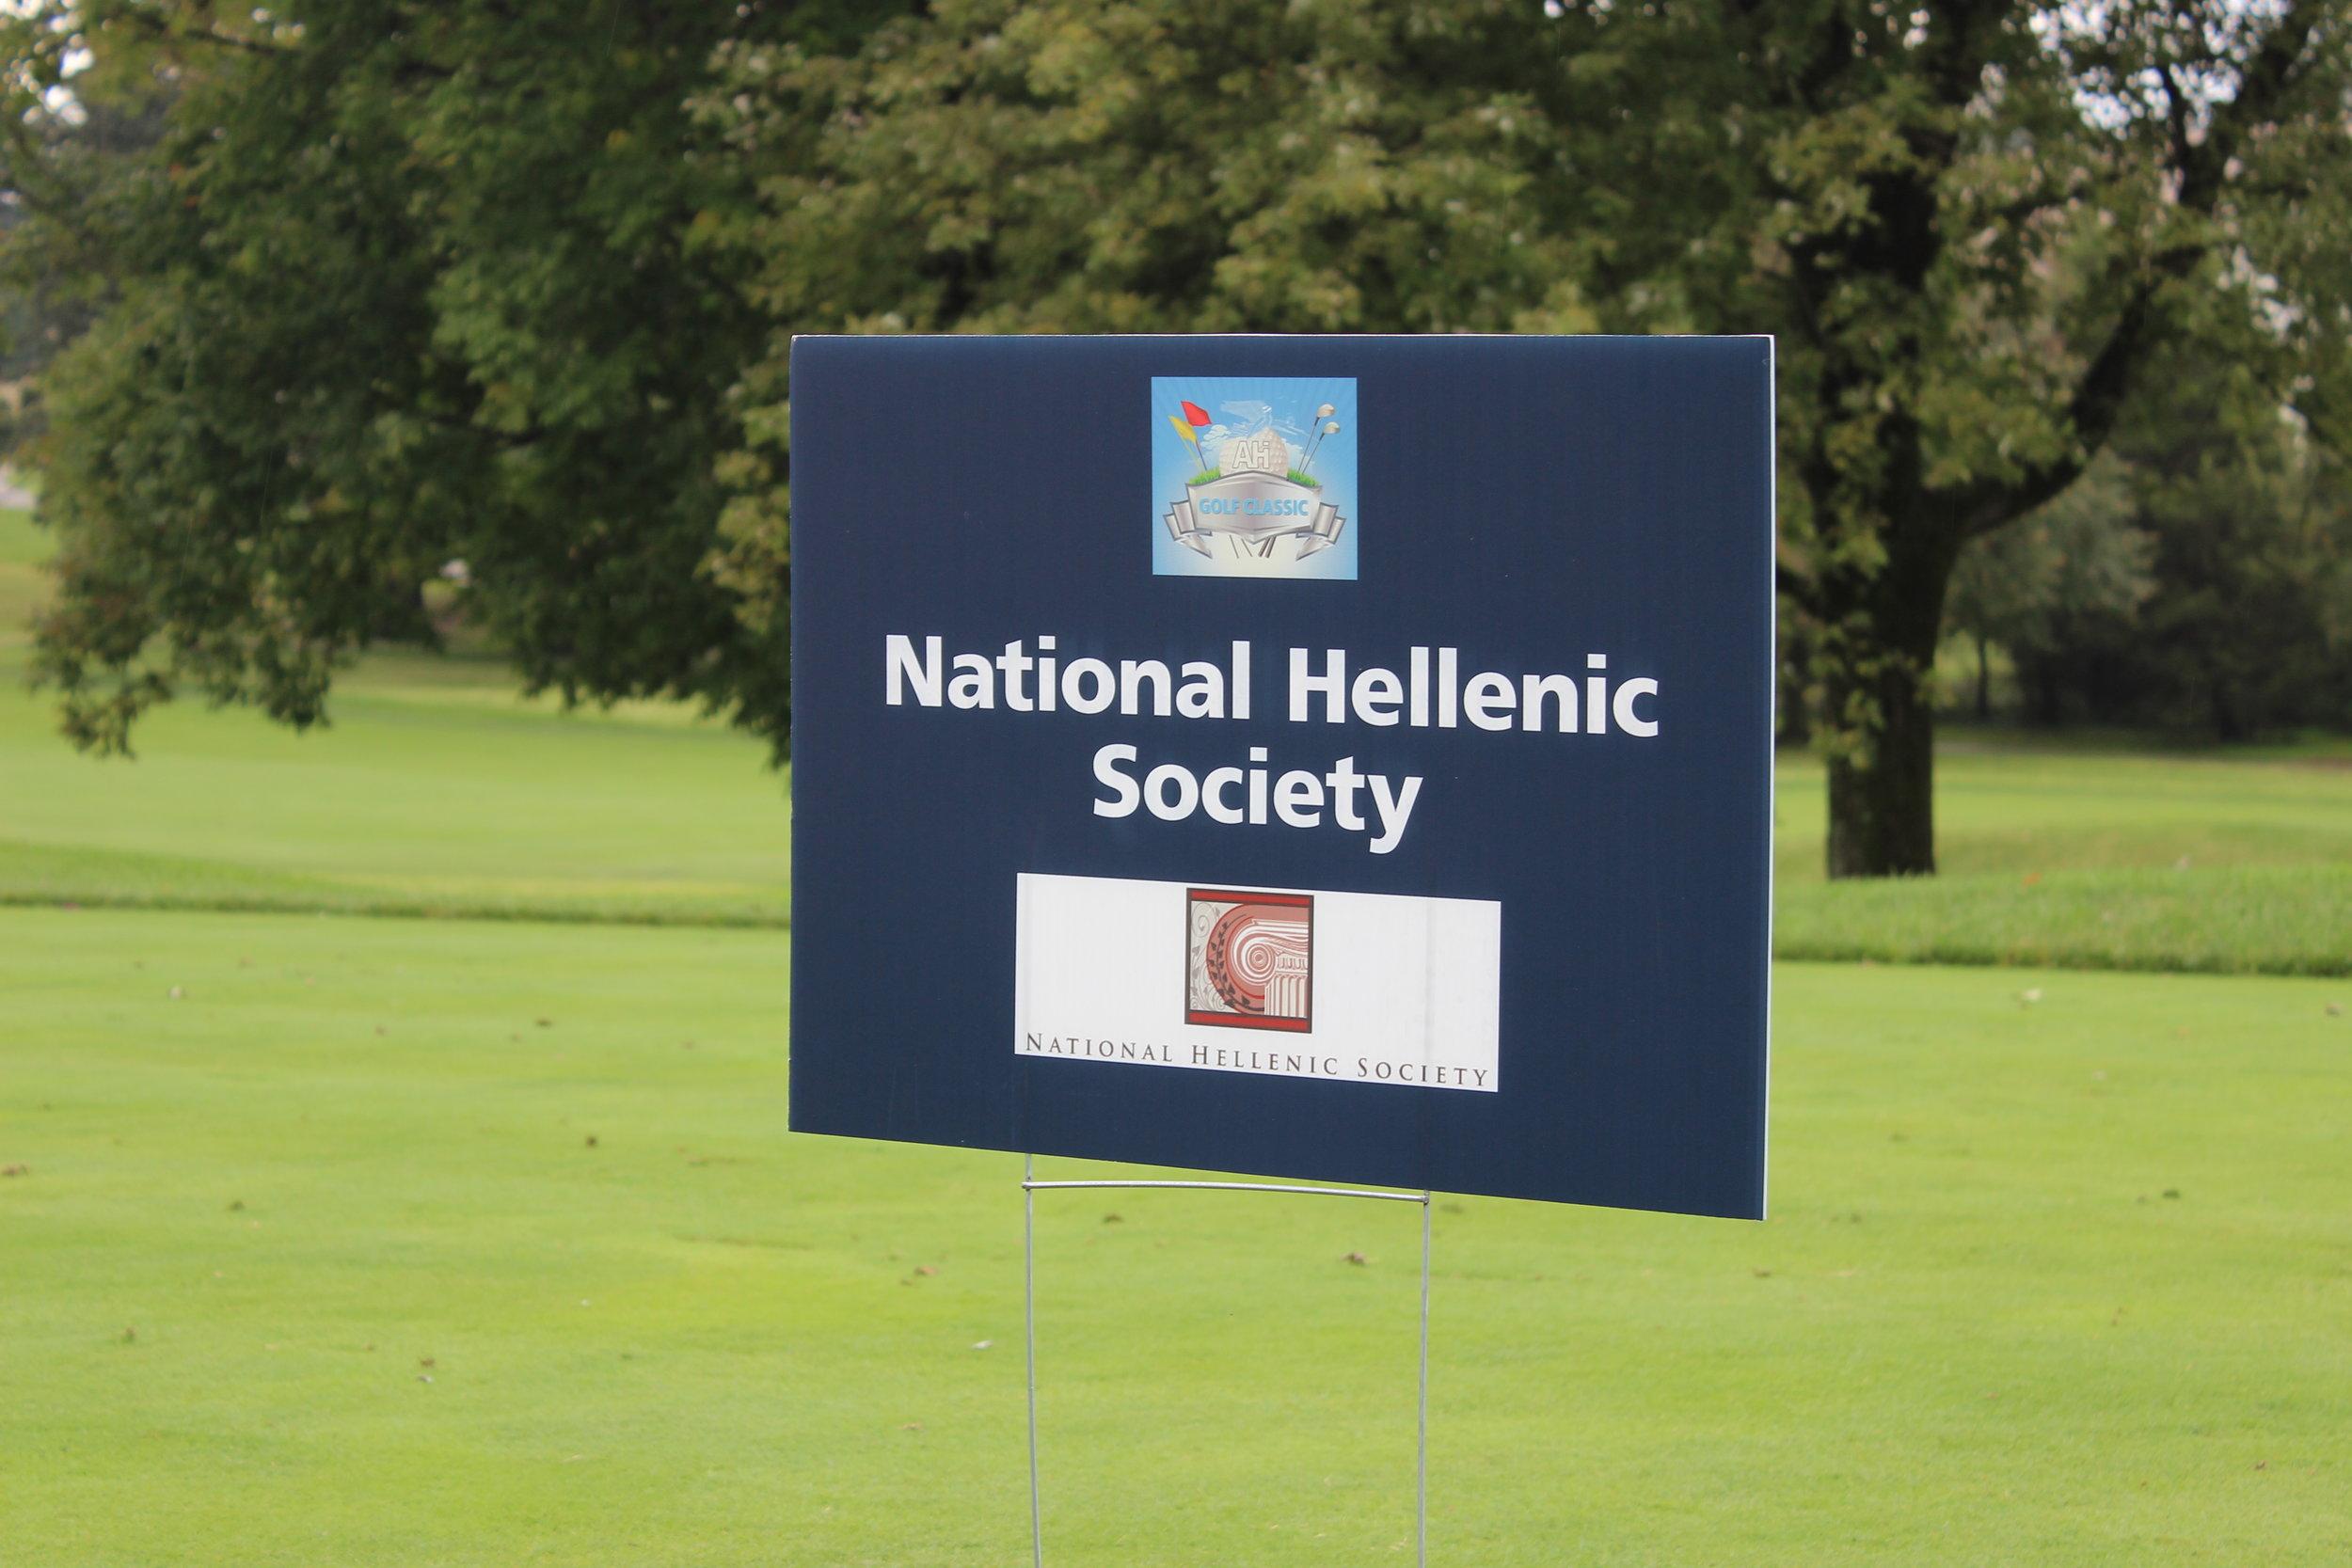 National Hellenic Society, Hole Sponsor.